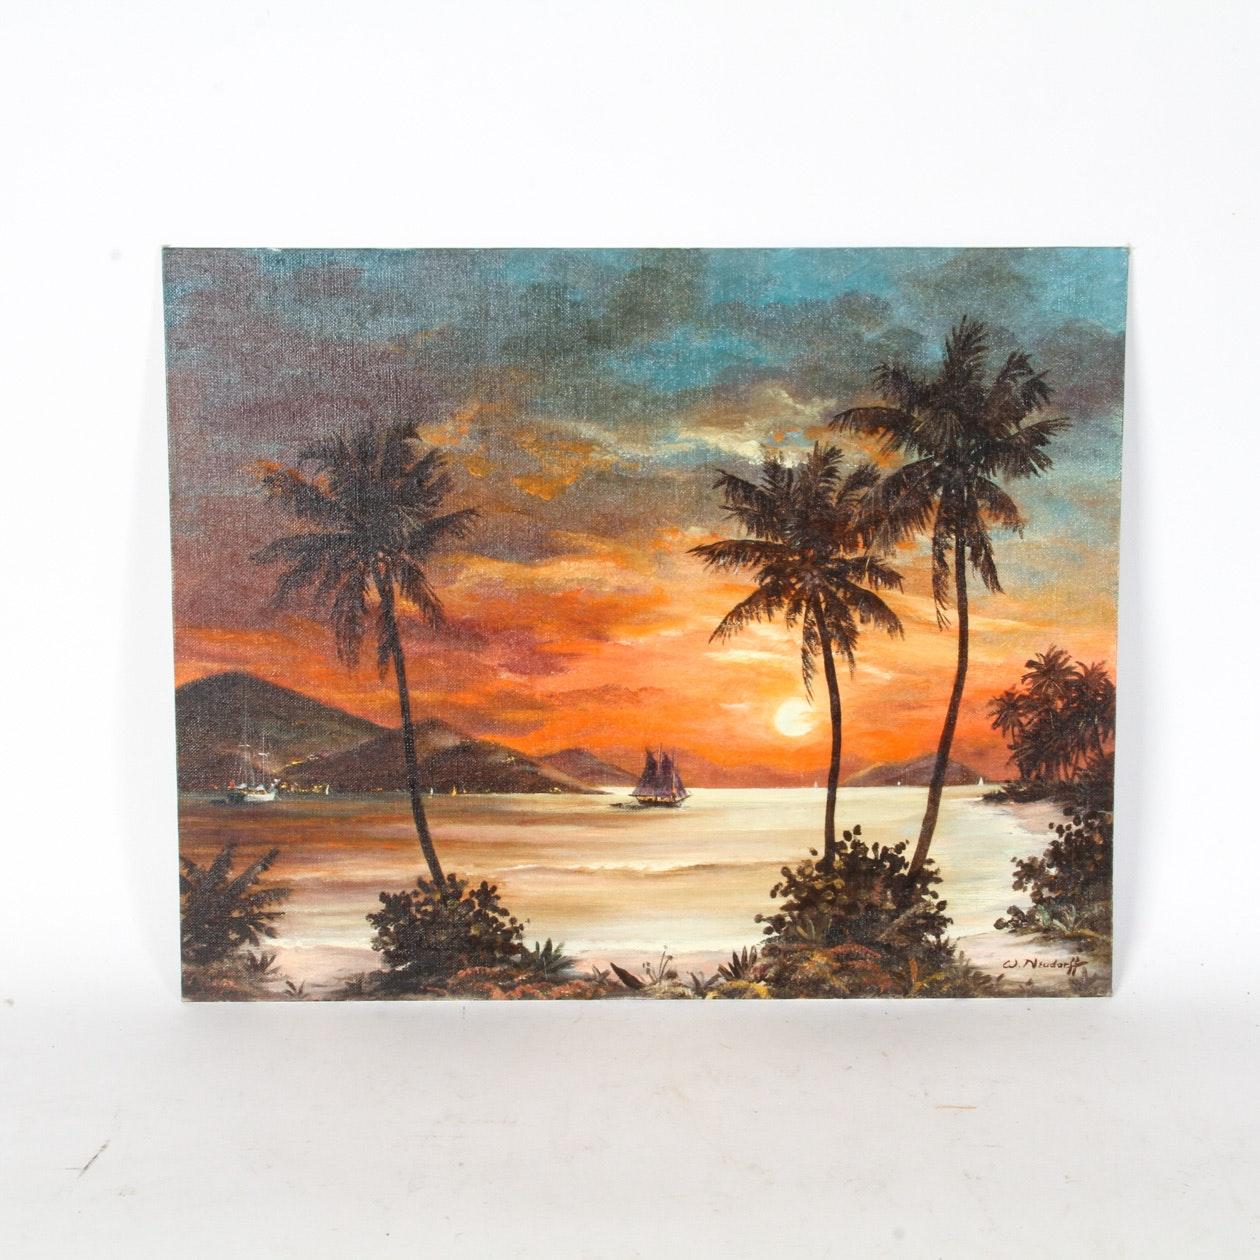 W. Neudorff Oil Painting on Board